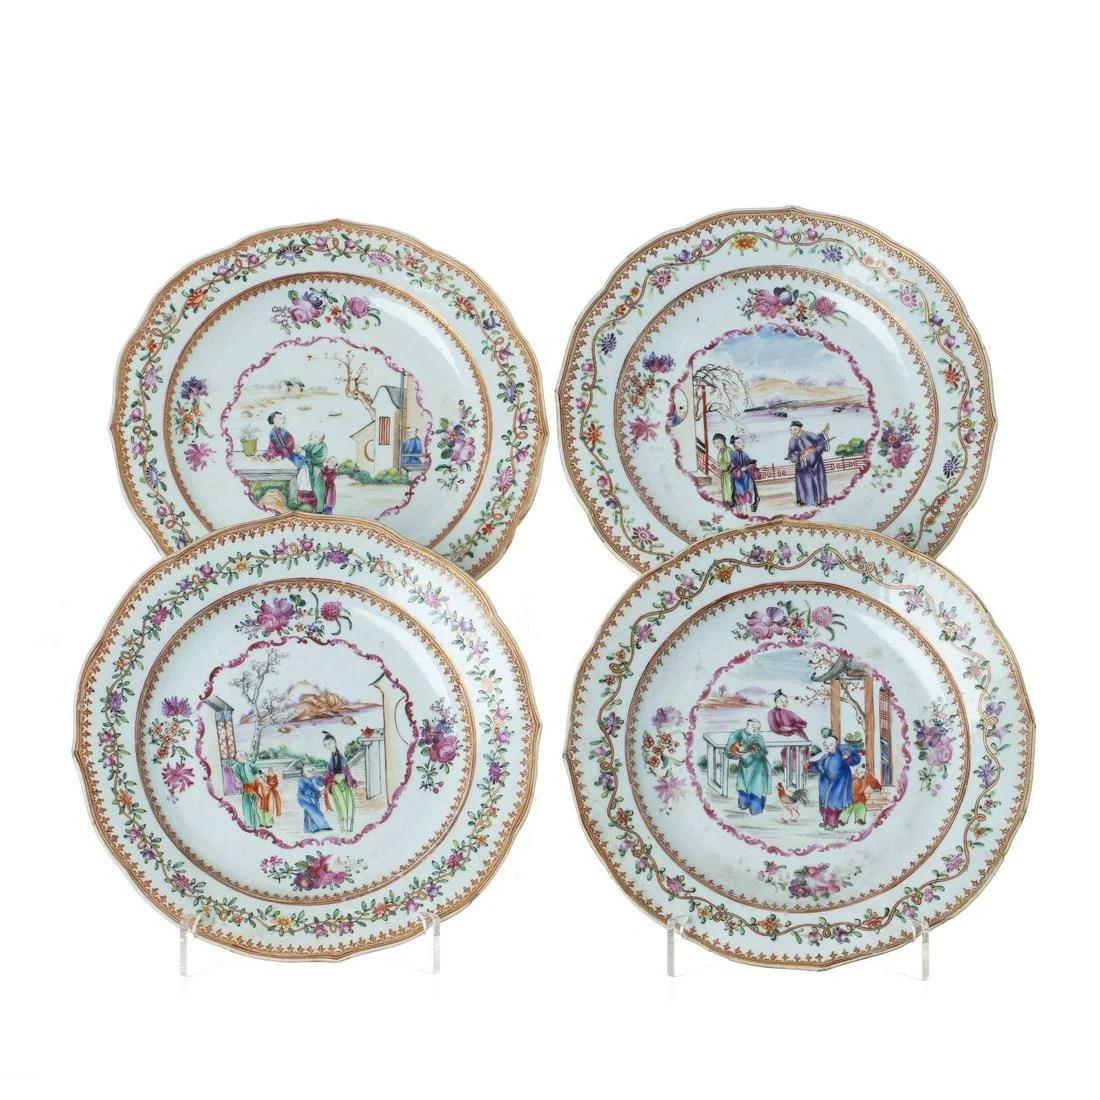 Four 'Mandarin' plates in Chinese porcelain, Qianlong